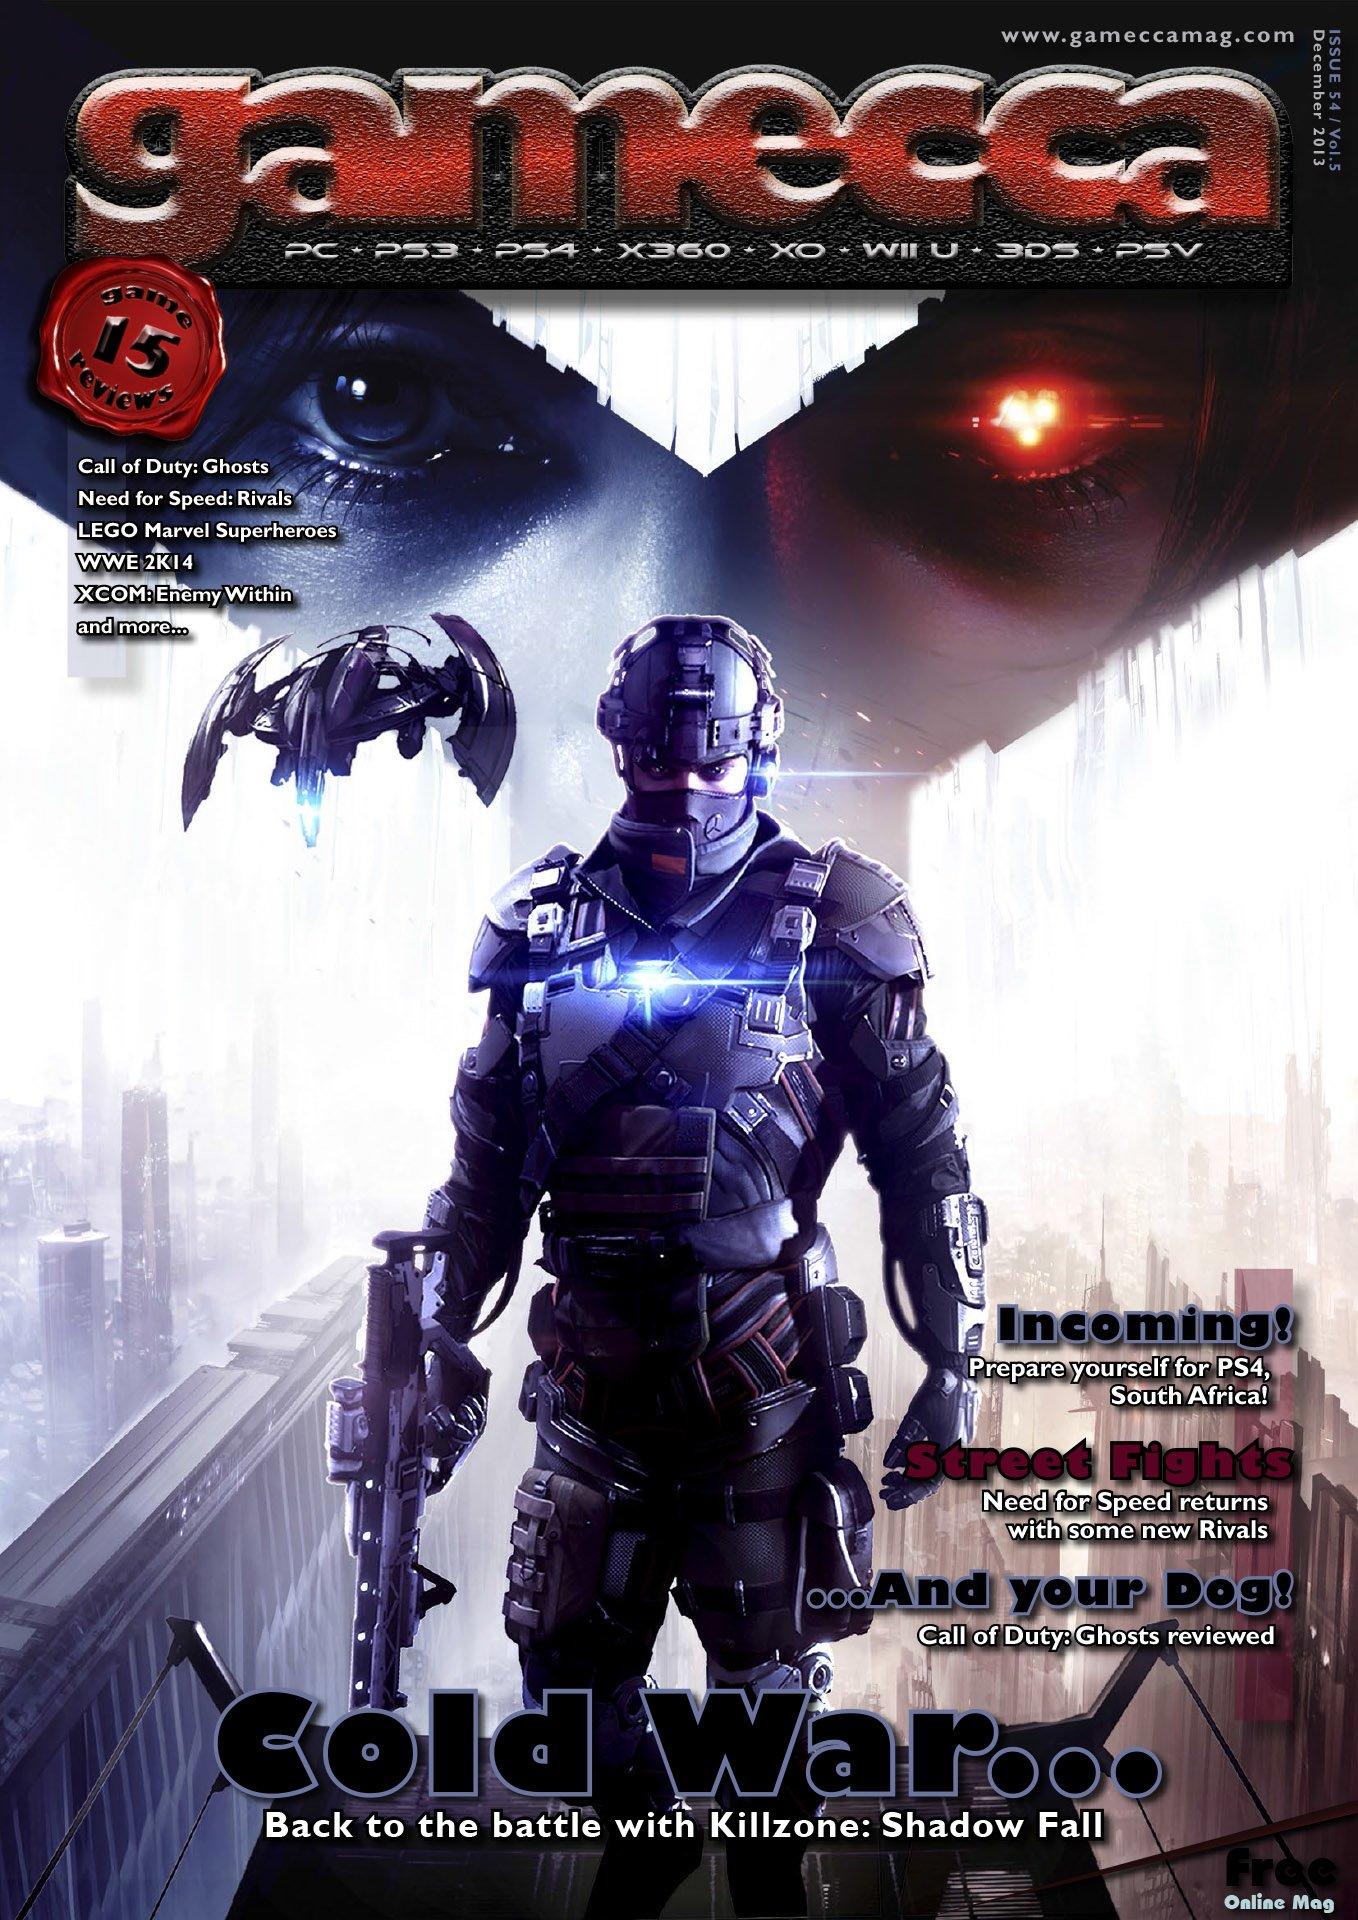 Gamecca 054 (December 2013)